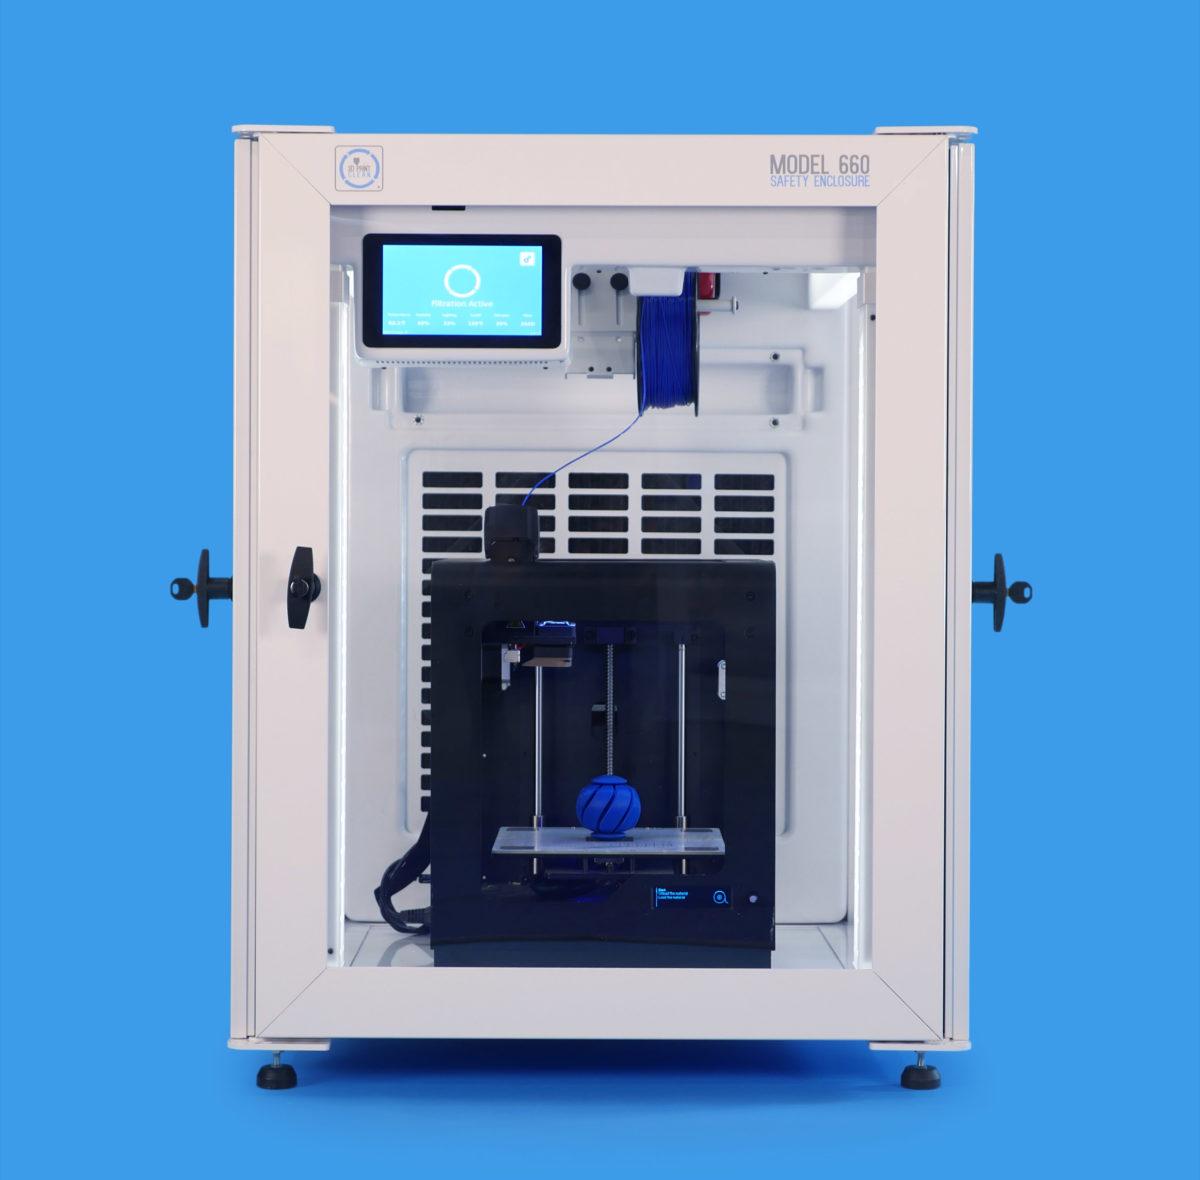 3D Print Clean Series 660 Safety Enclosure